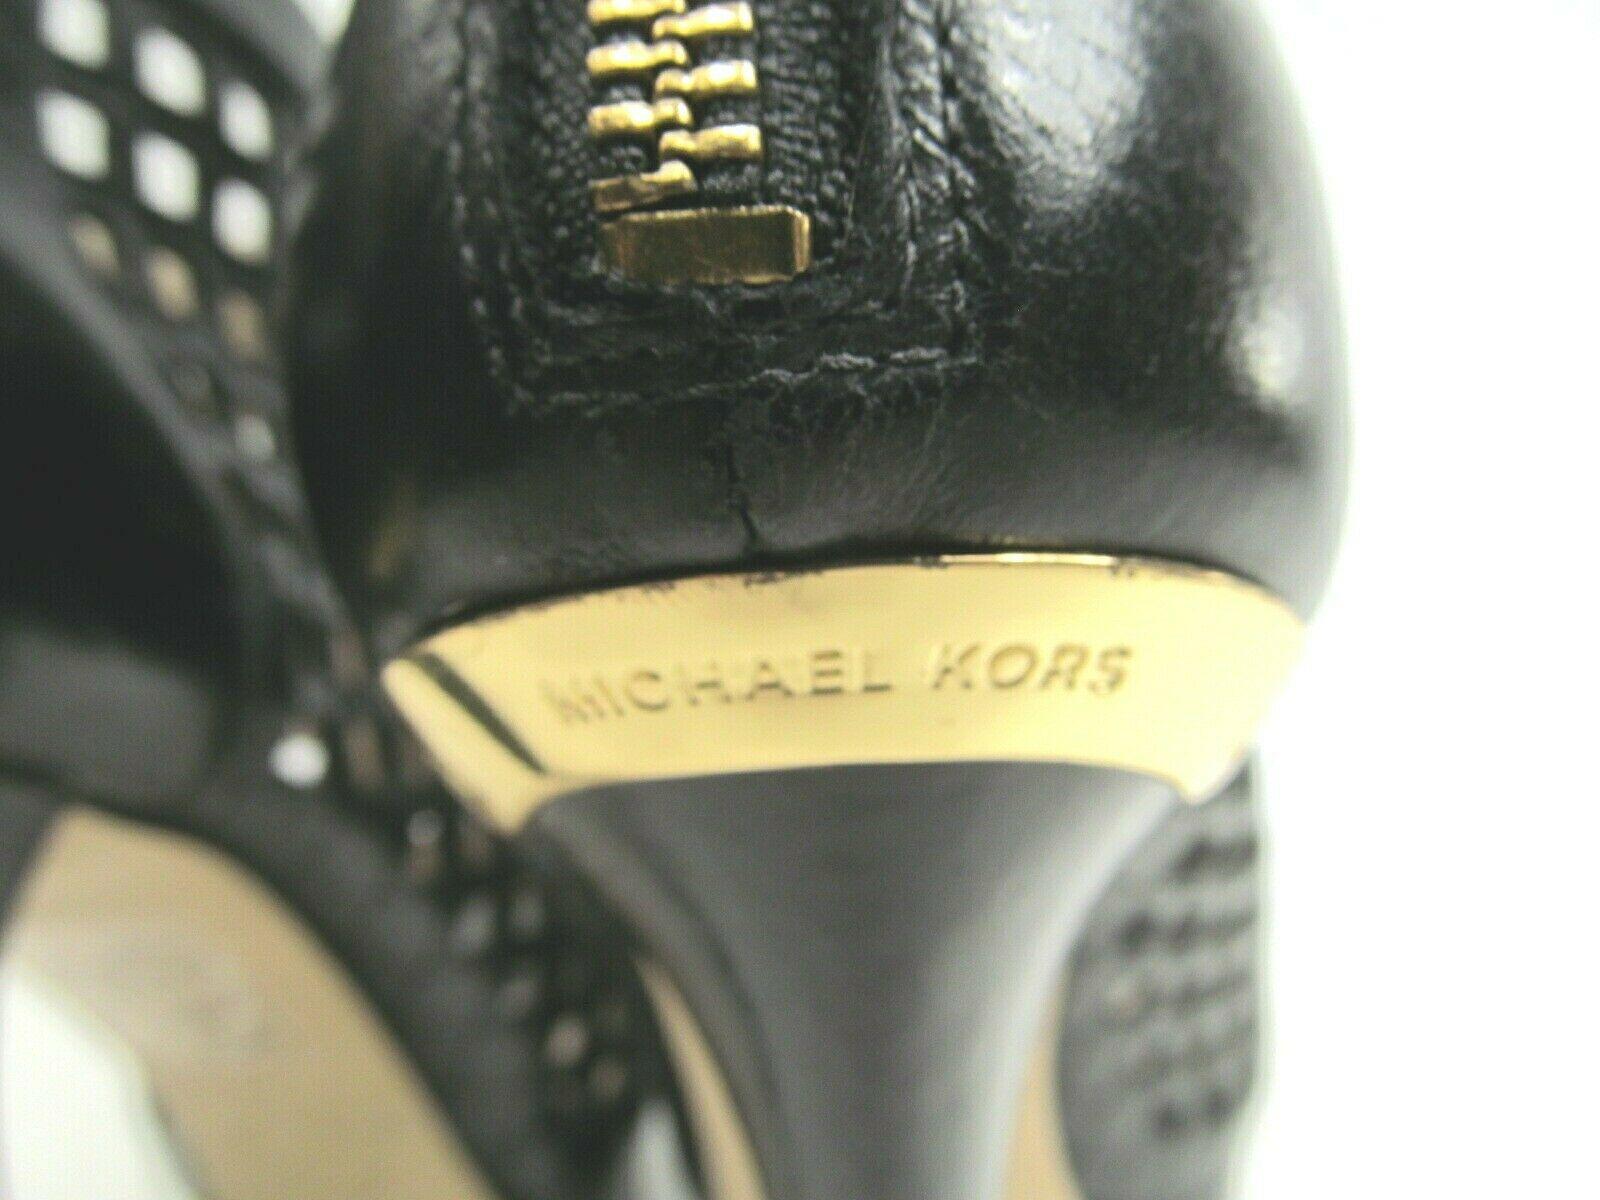 Michael Kors Womens Peep Toe Stilettos Platforms With Cutouts Size US 6 M image 3